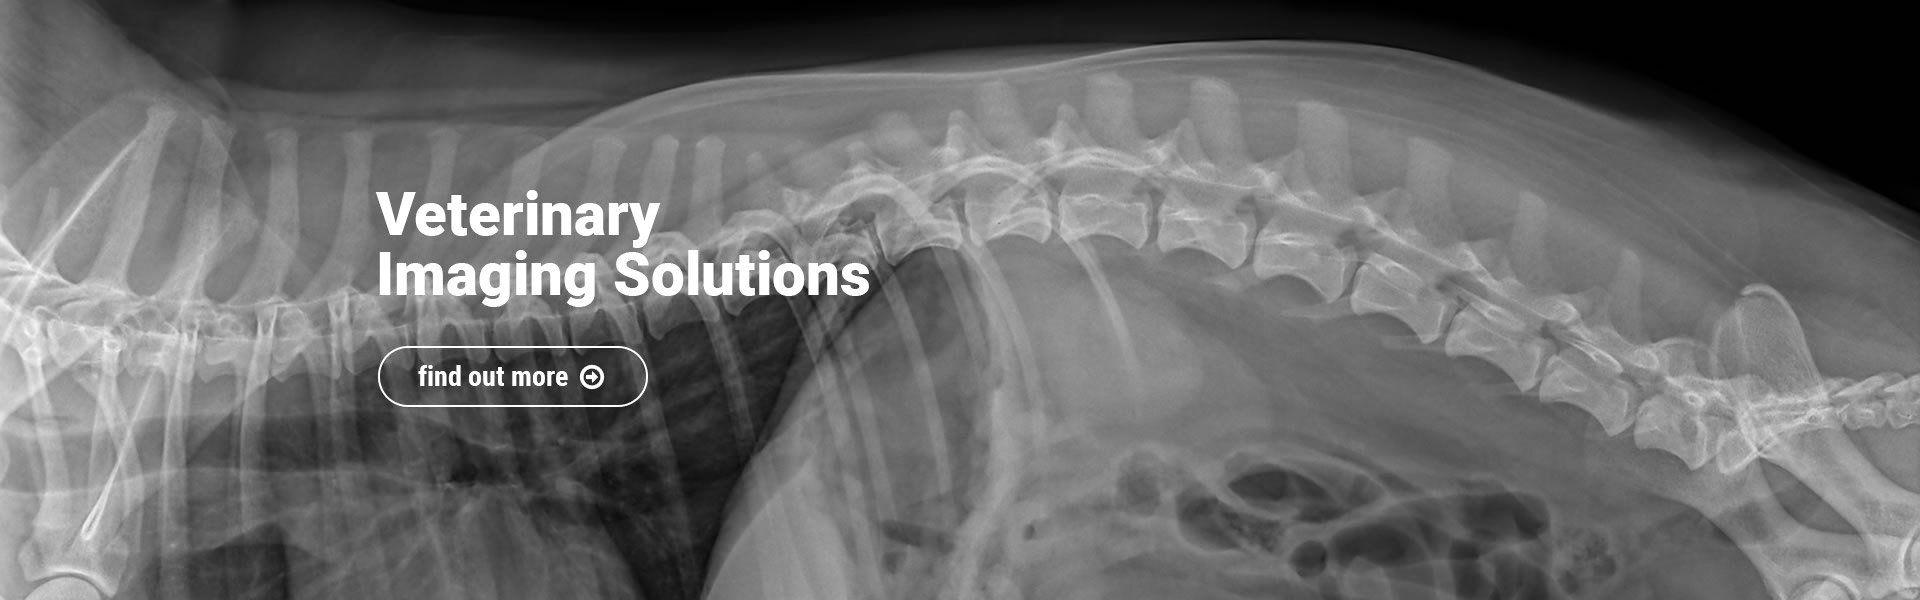 Veterinary Imaging Solutions